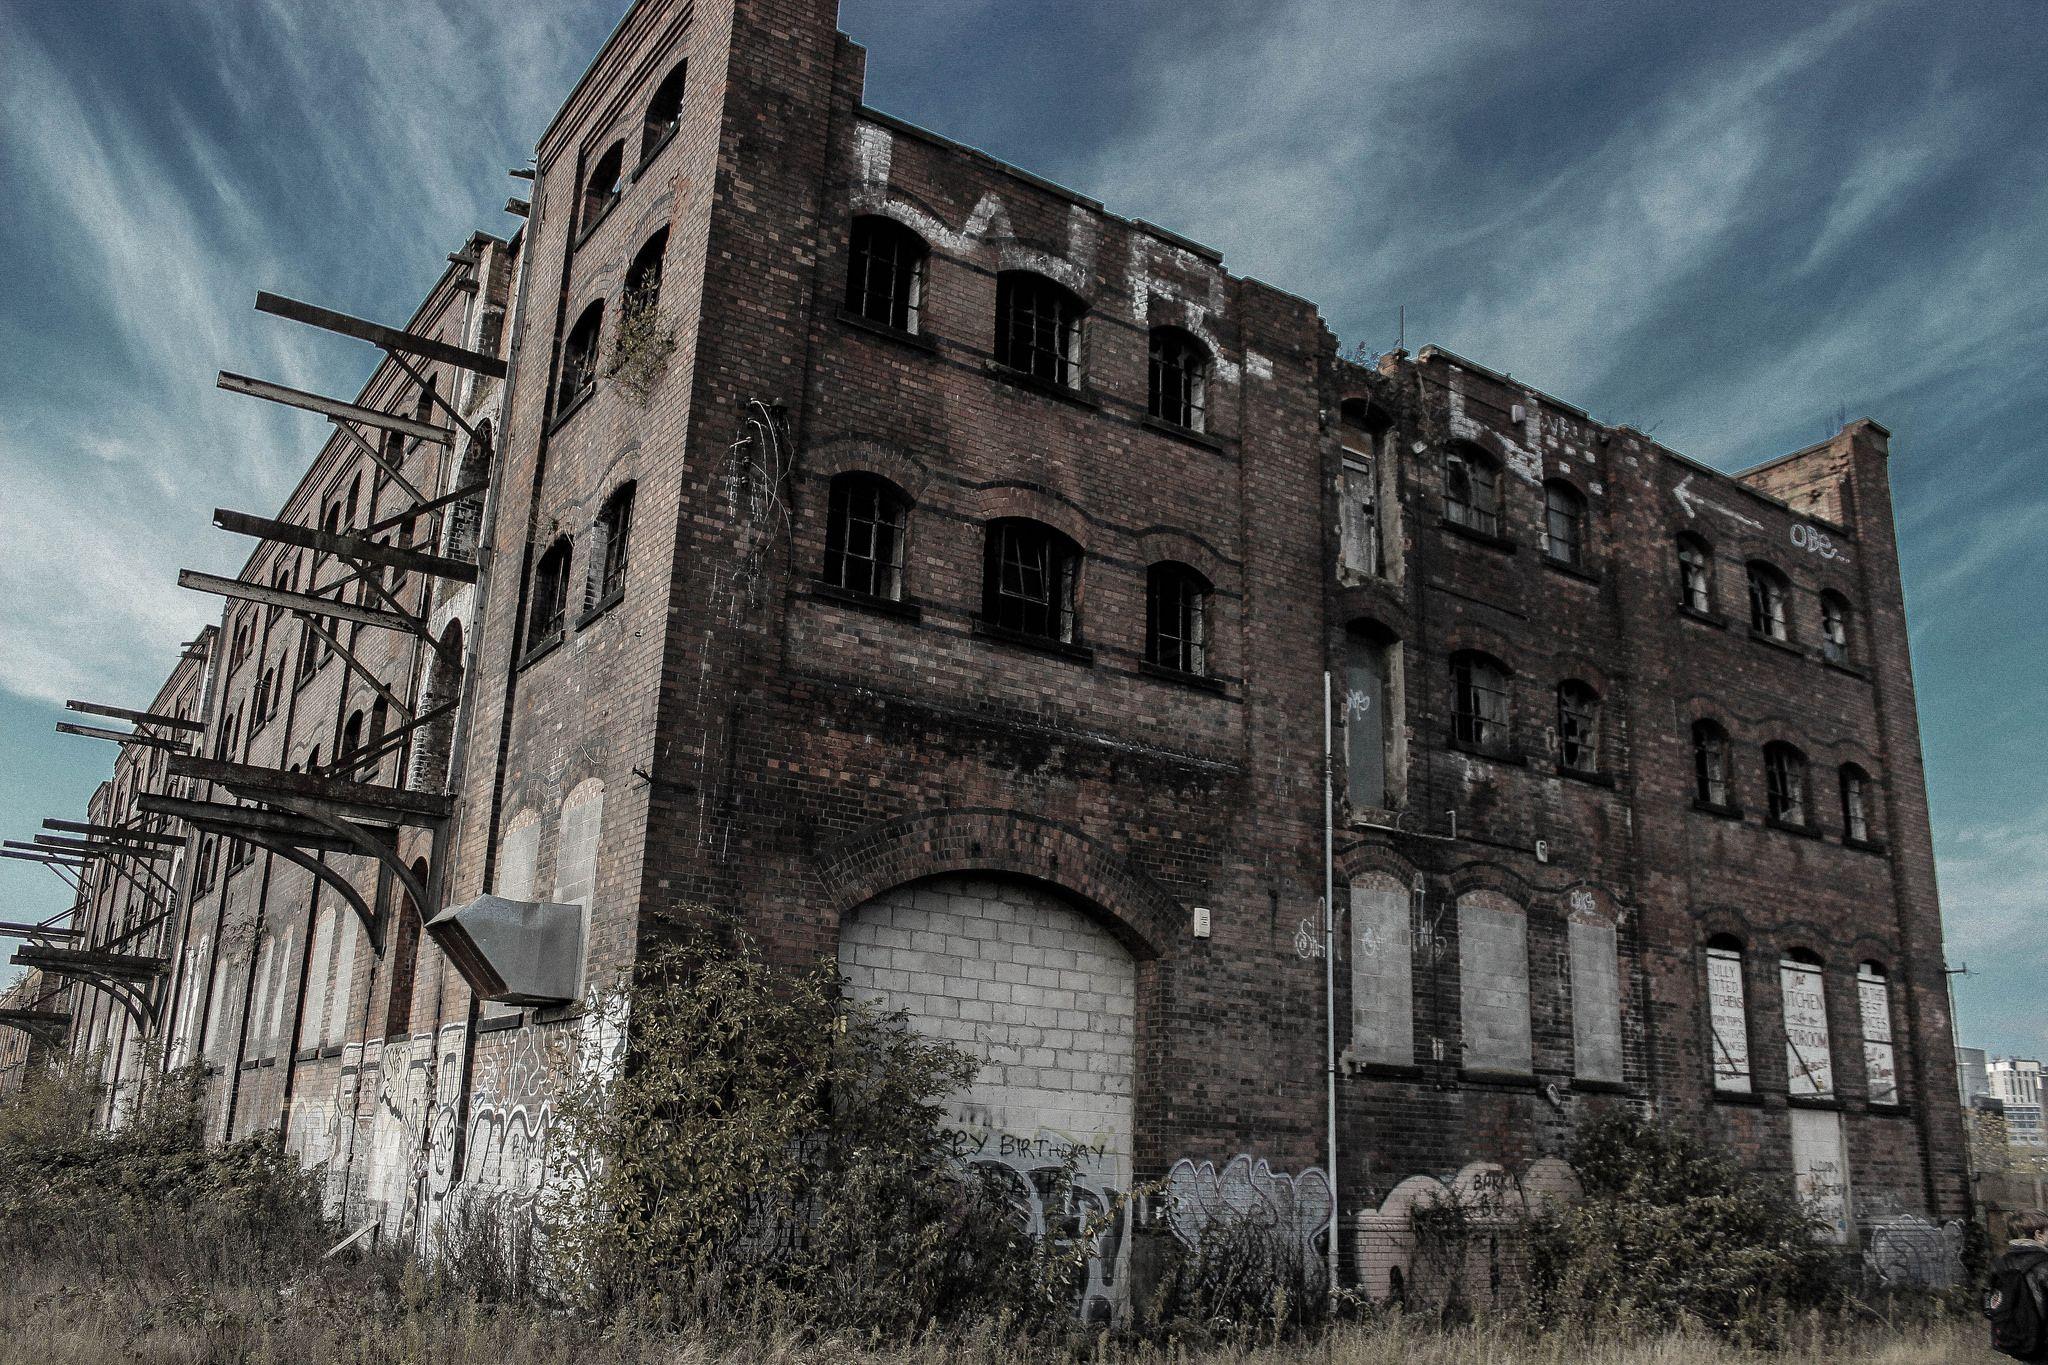 Abandoned Warehouse, Urban Decay Sneinton Nottingham